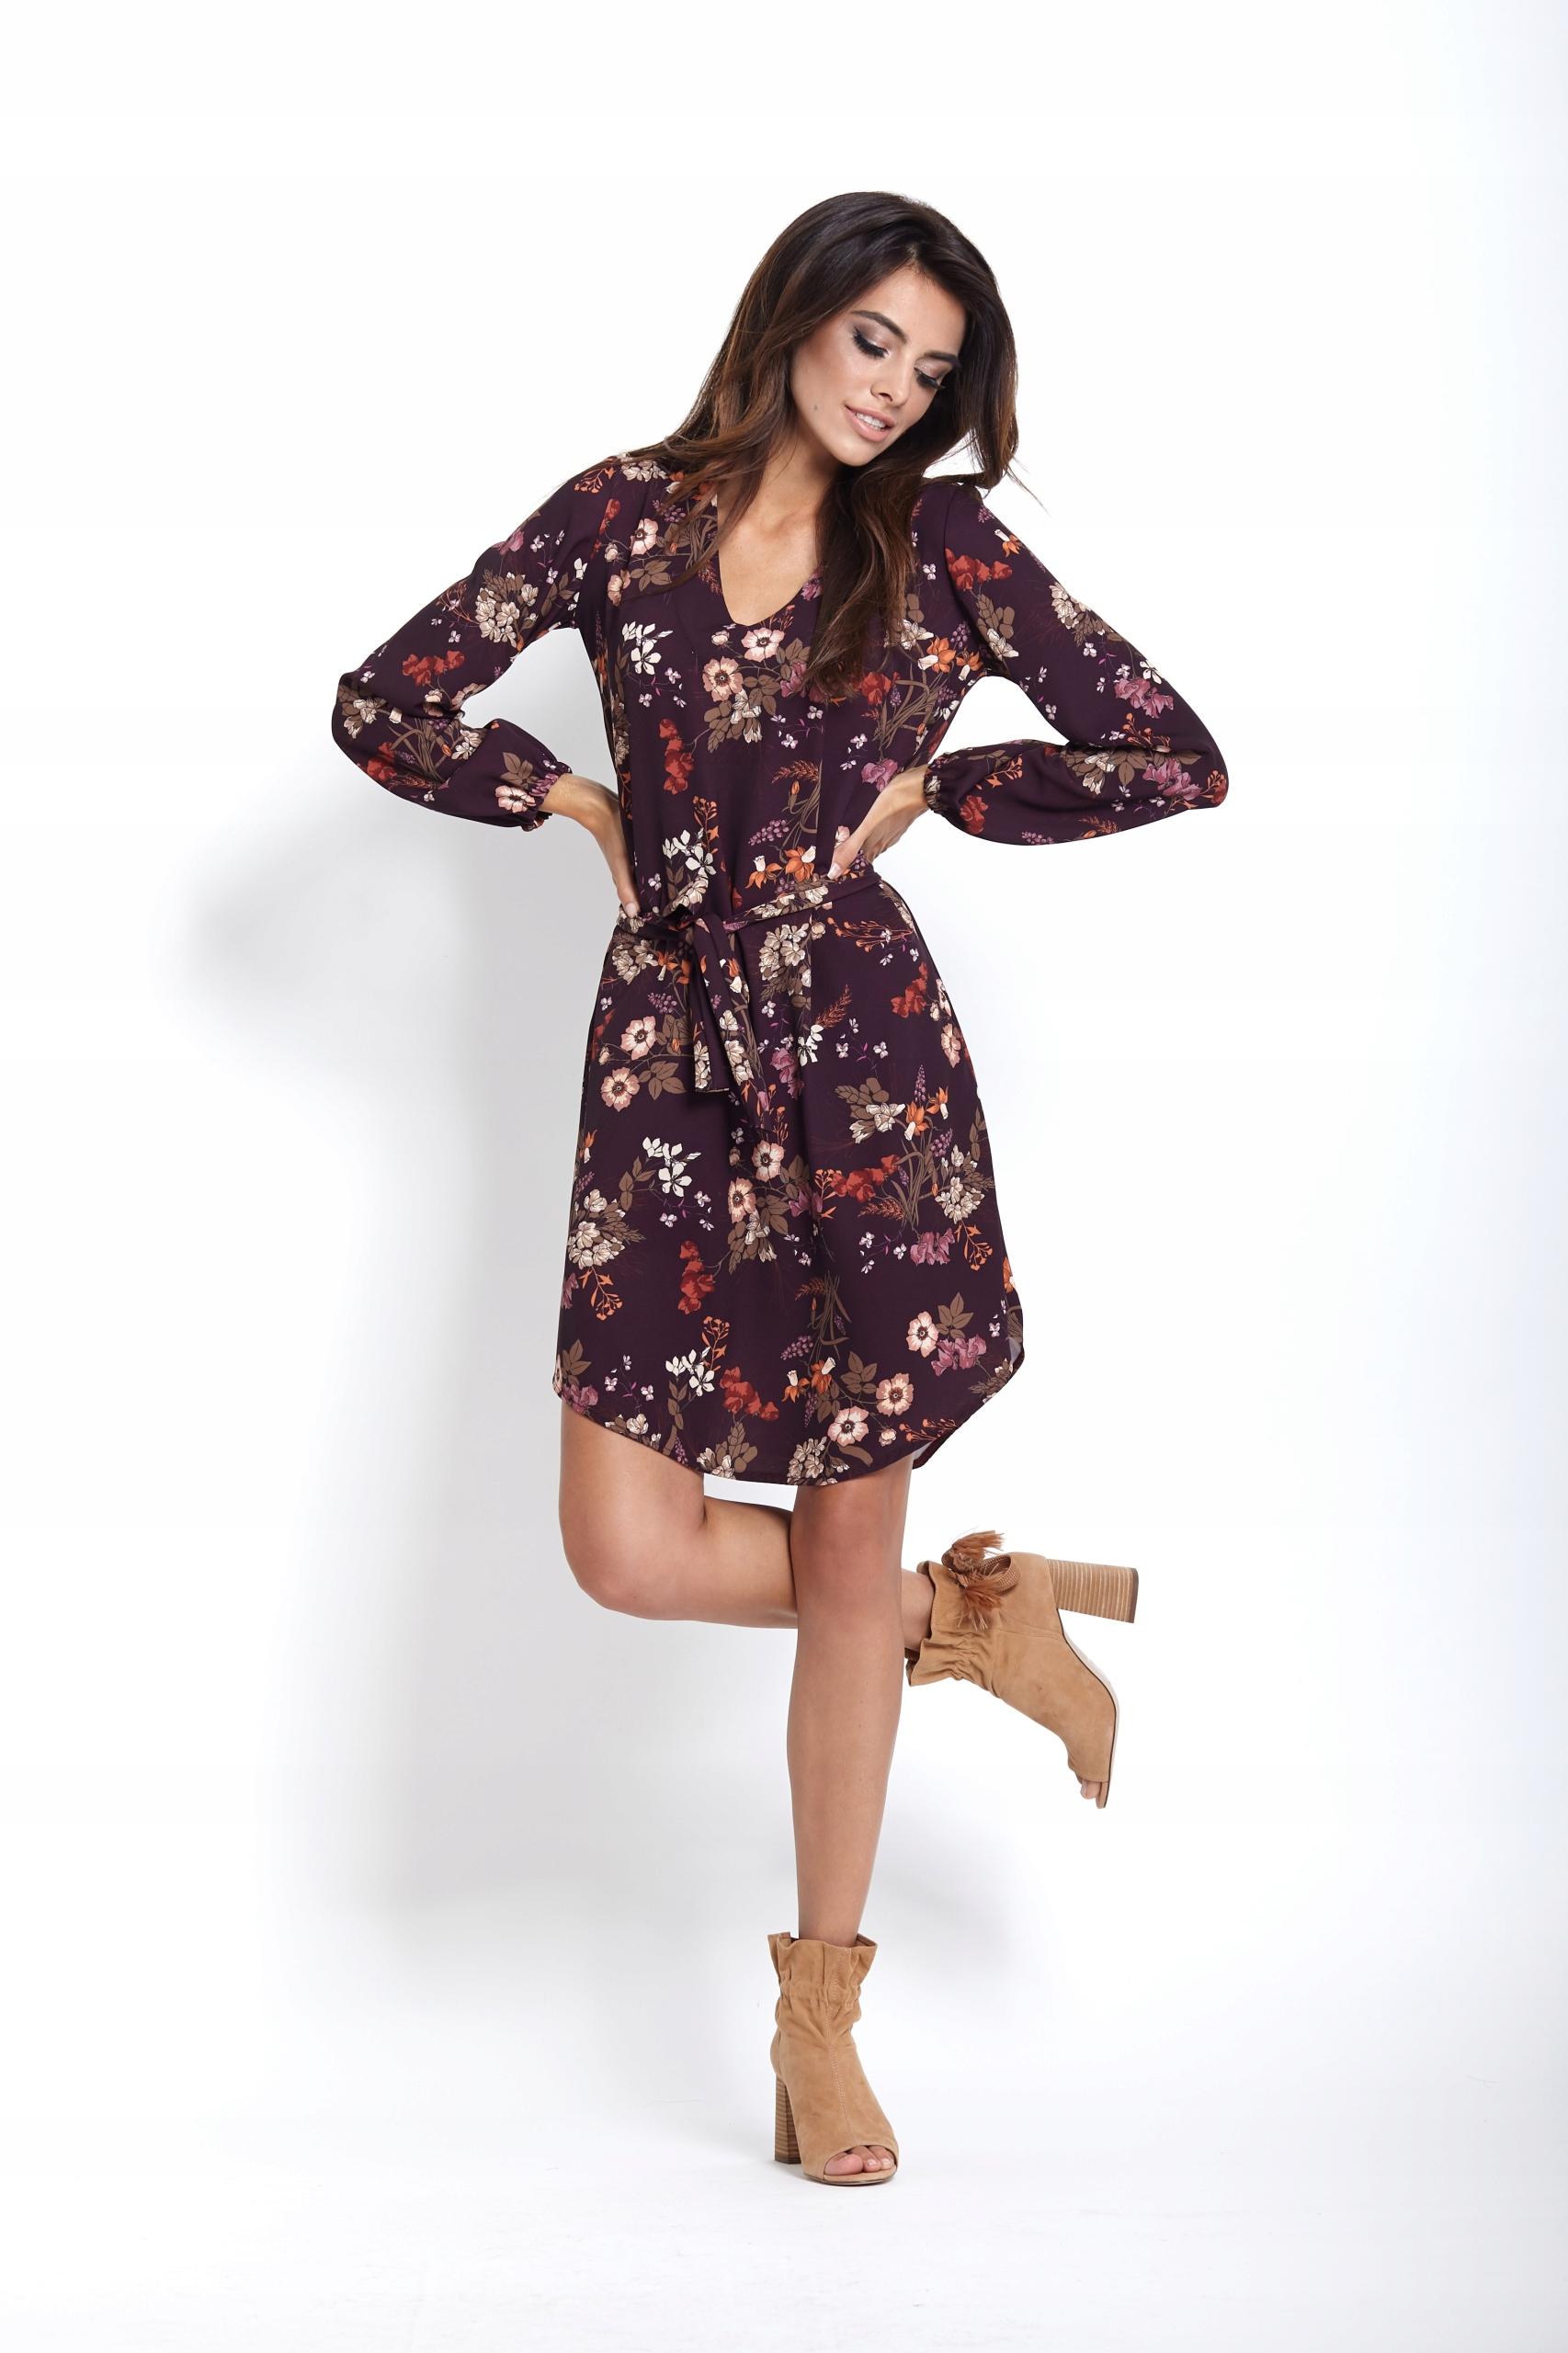 b7d250d3c4 Sukienka o prostym kroju - Karina - kwiaty M - 7674260043 ...